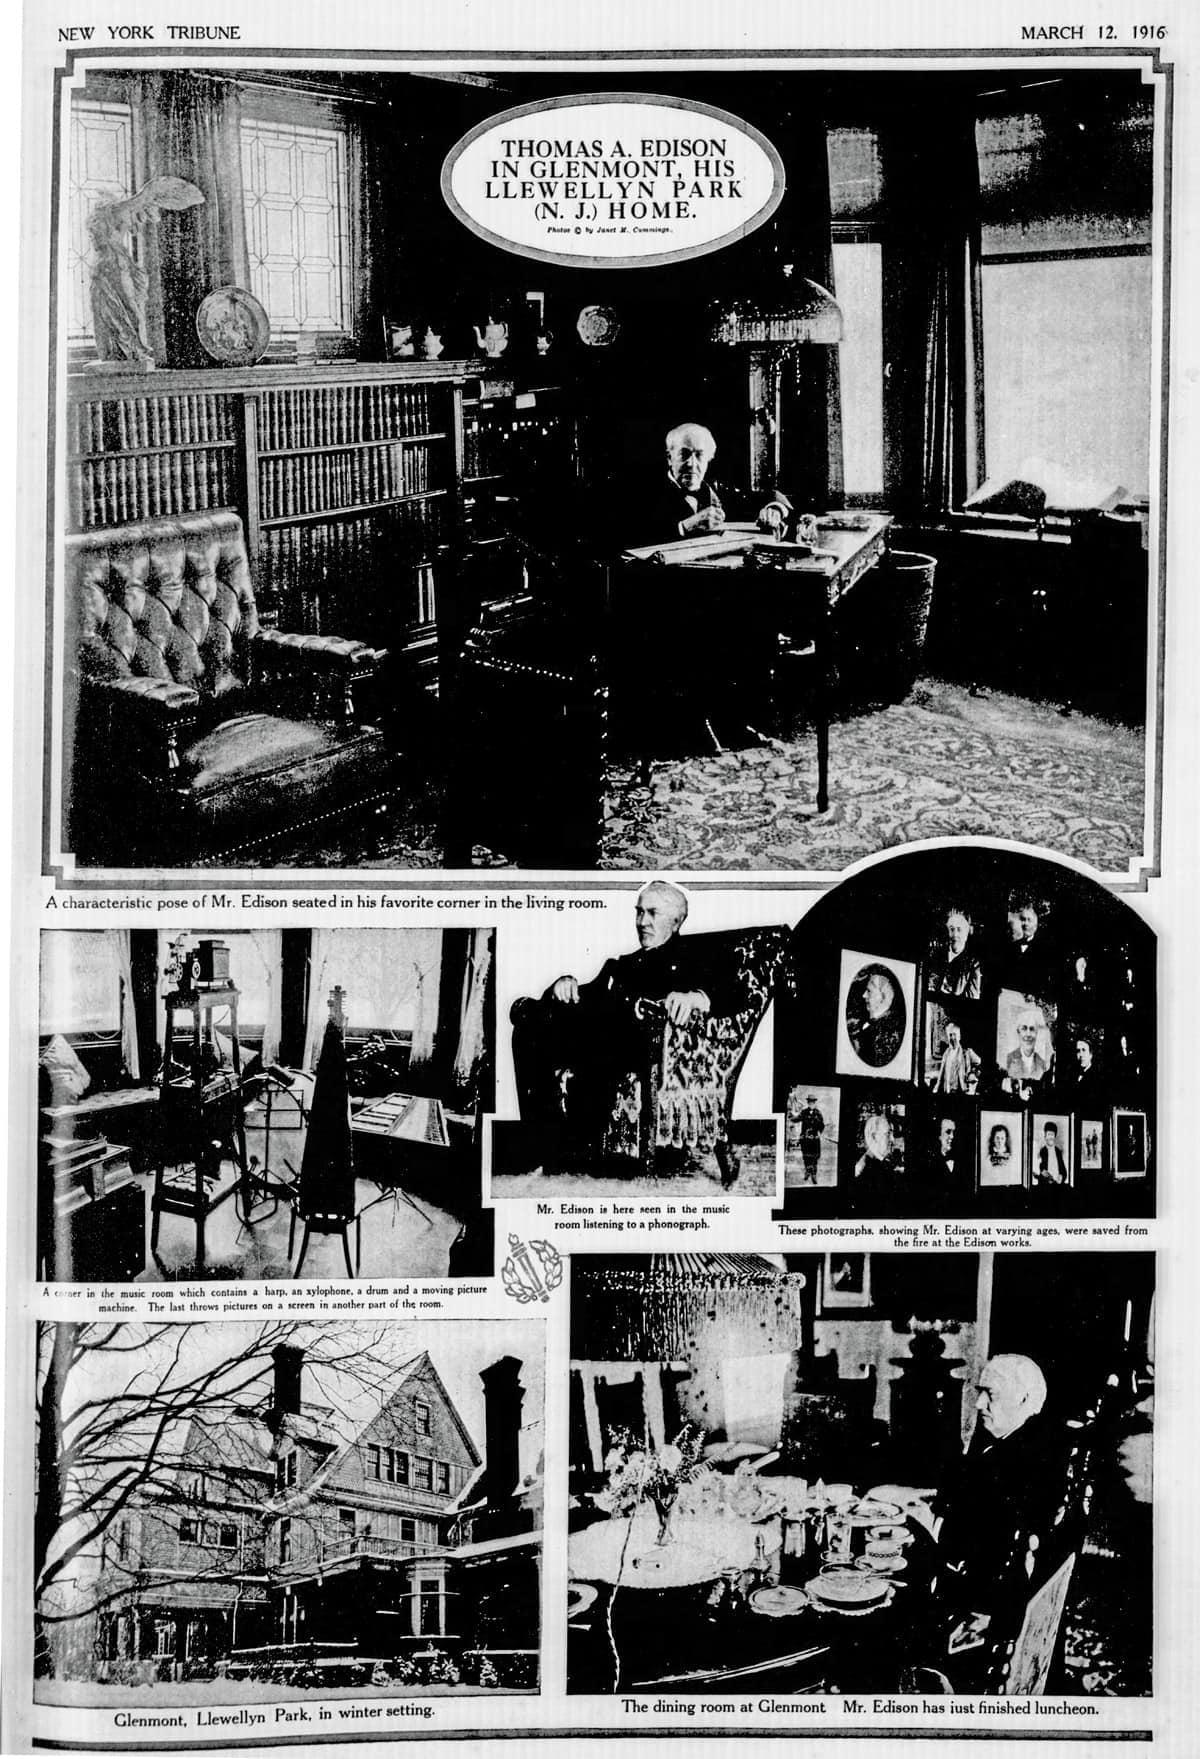 Thomas Edison at home (1916)